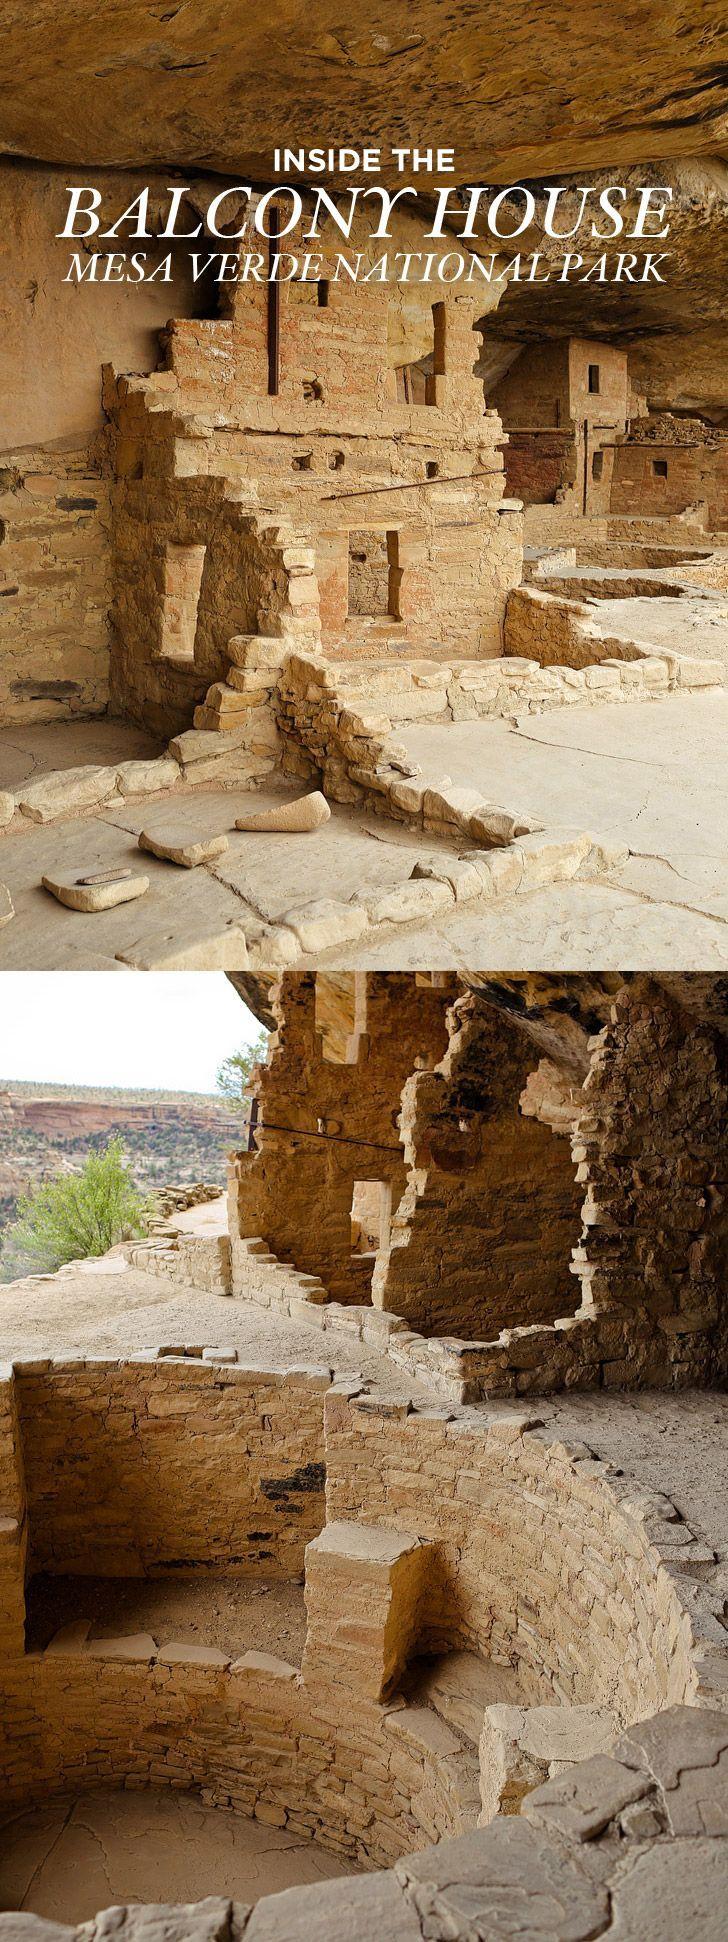 Balcony House Mesa Verde National Park - ancient cliff dwellings built by Ancestral Puebloans // http://localadventurer.com